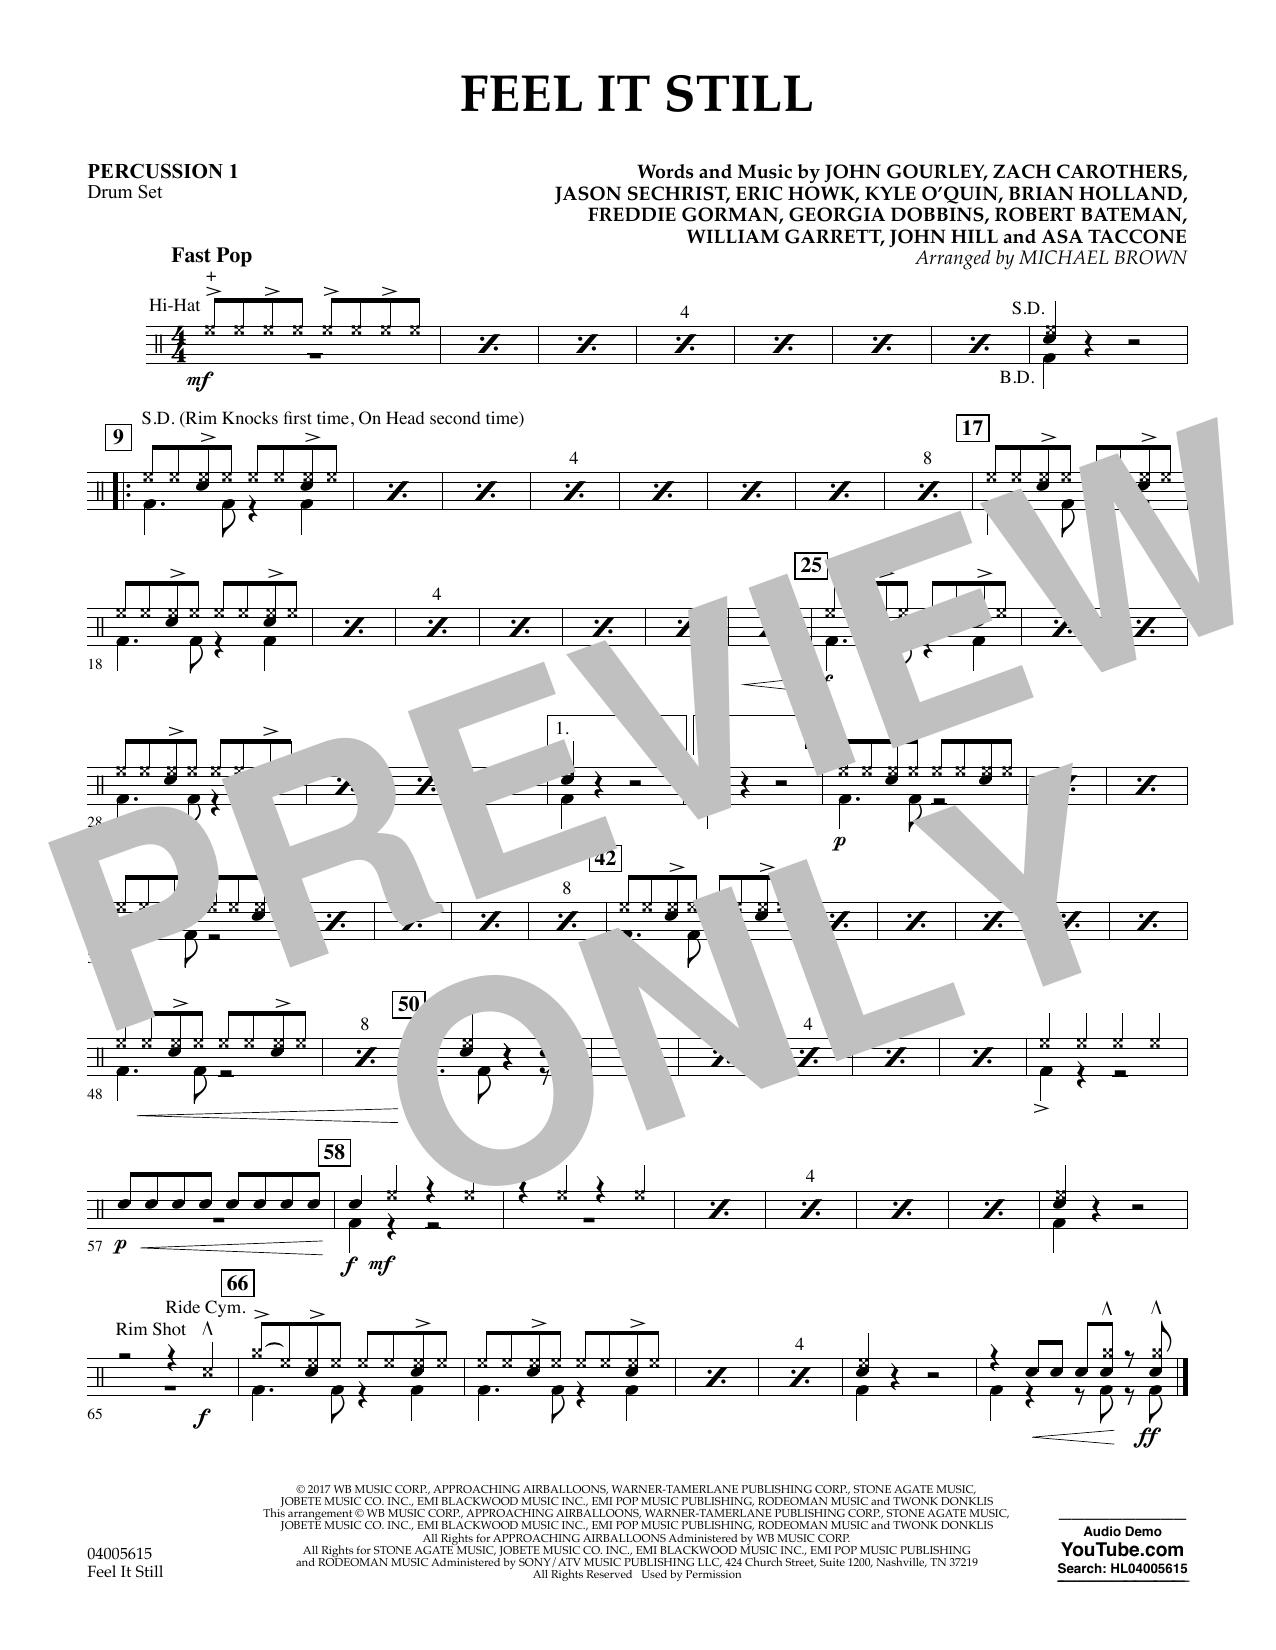 Feel It Still - Percussion 1 (Flex-Band)